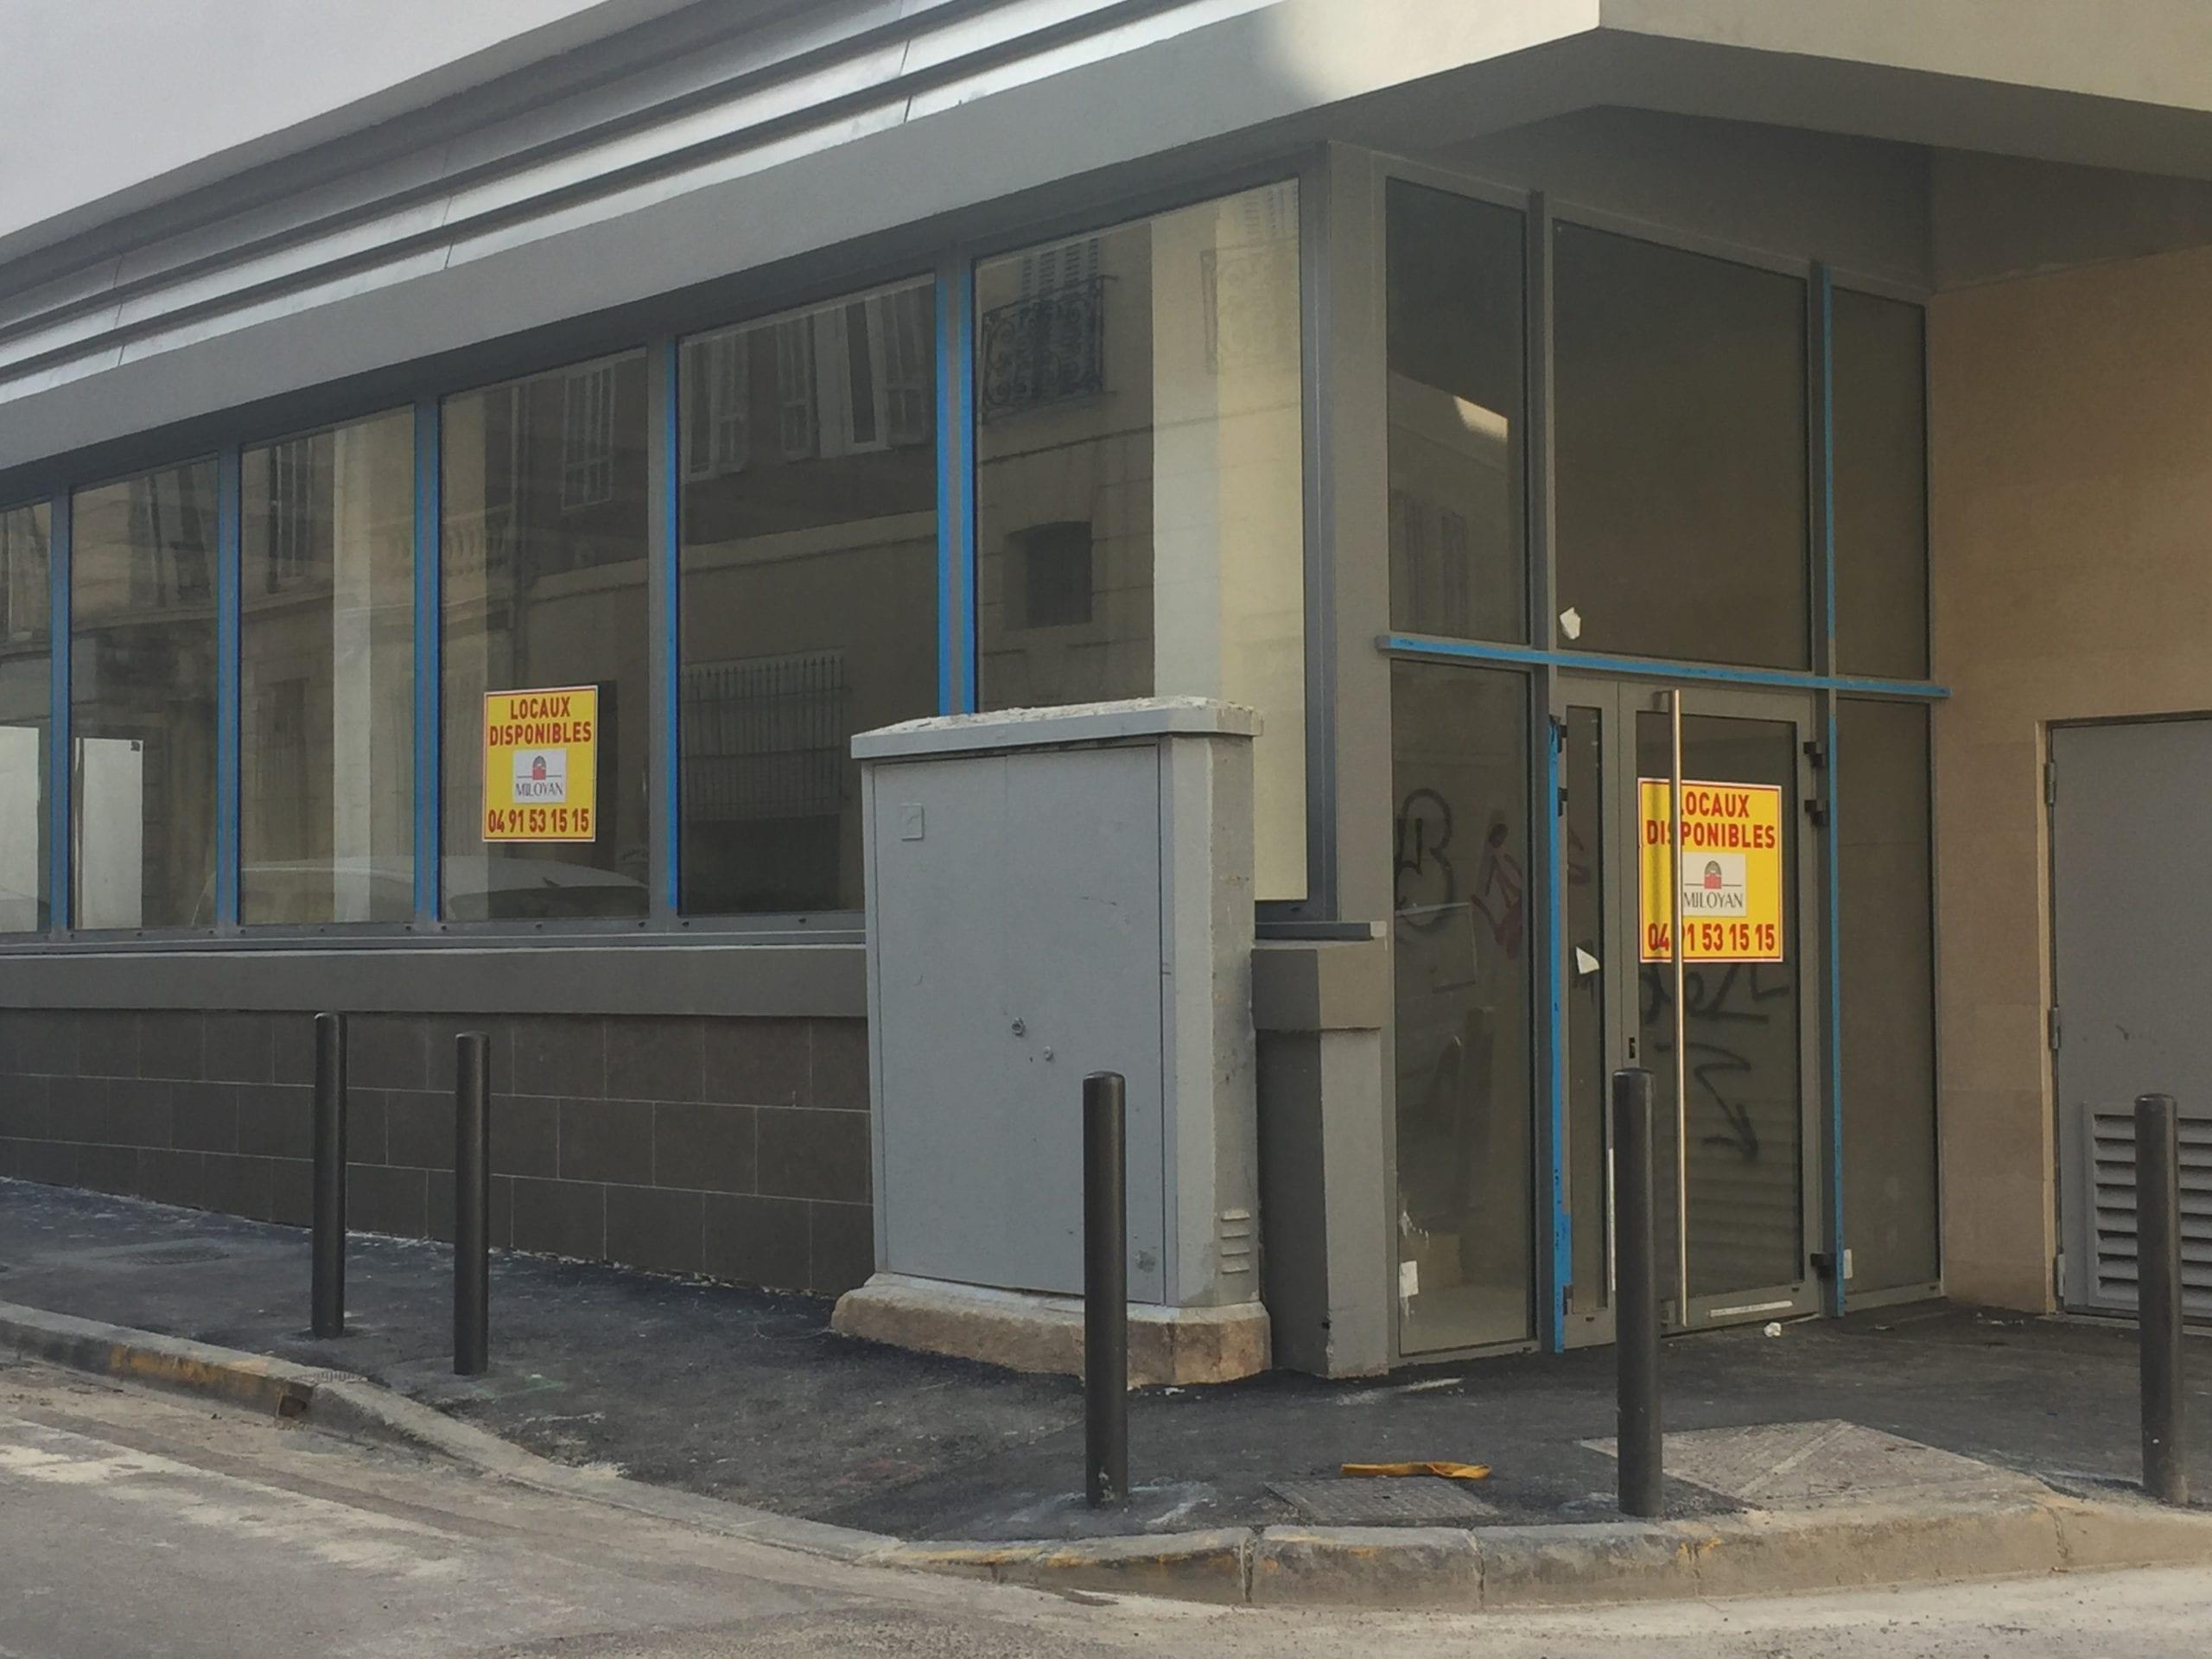 Location local commercial neuf 159 m² – Quartier Lodi – A louer Marseille 13006